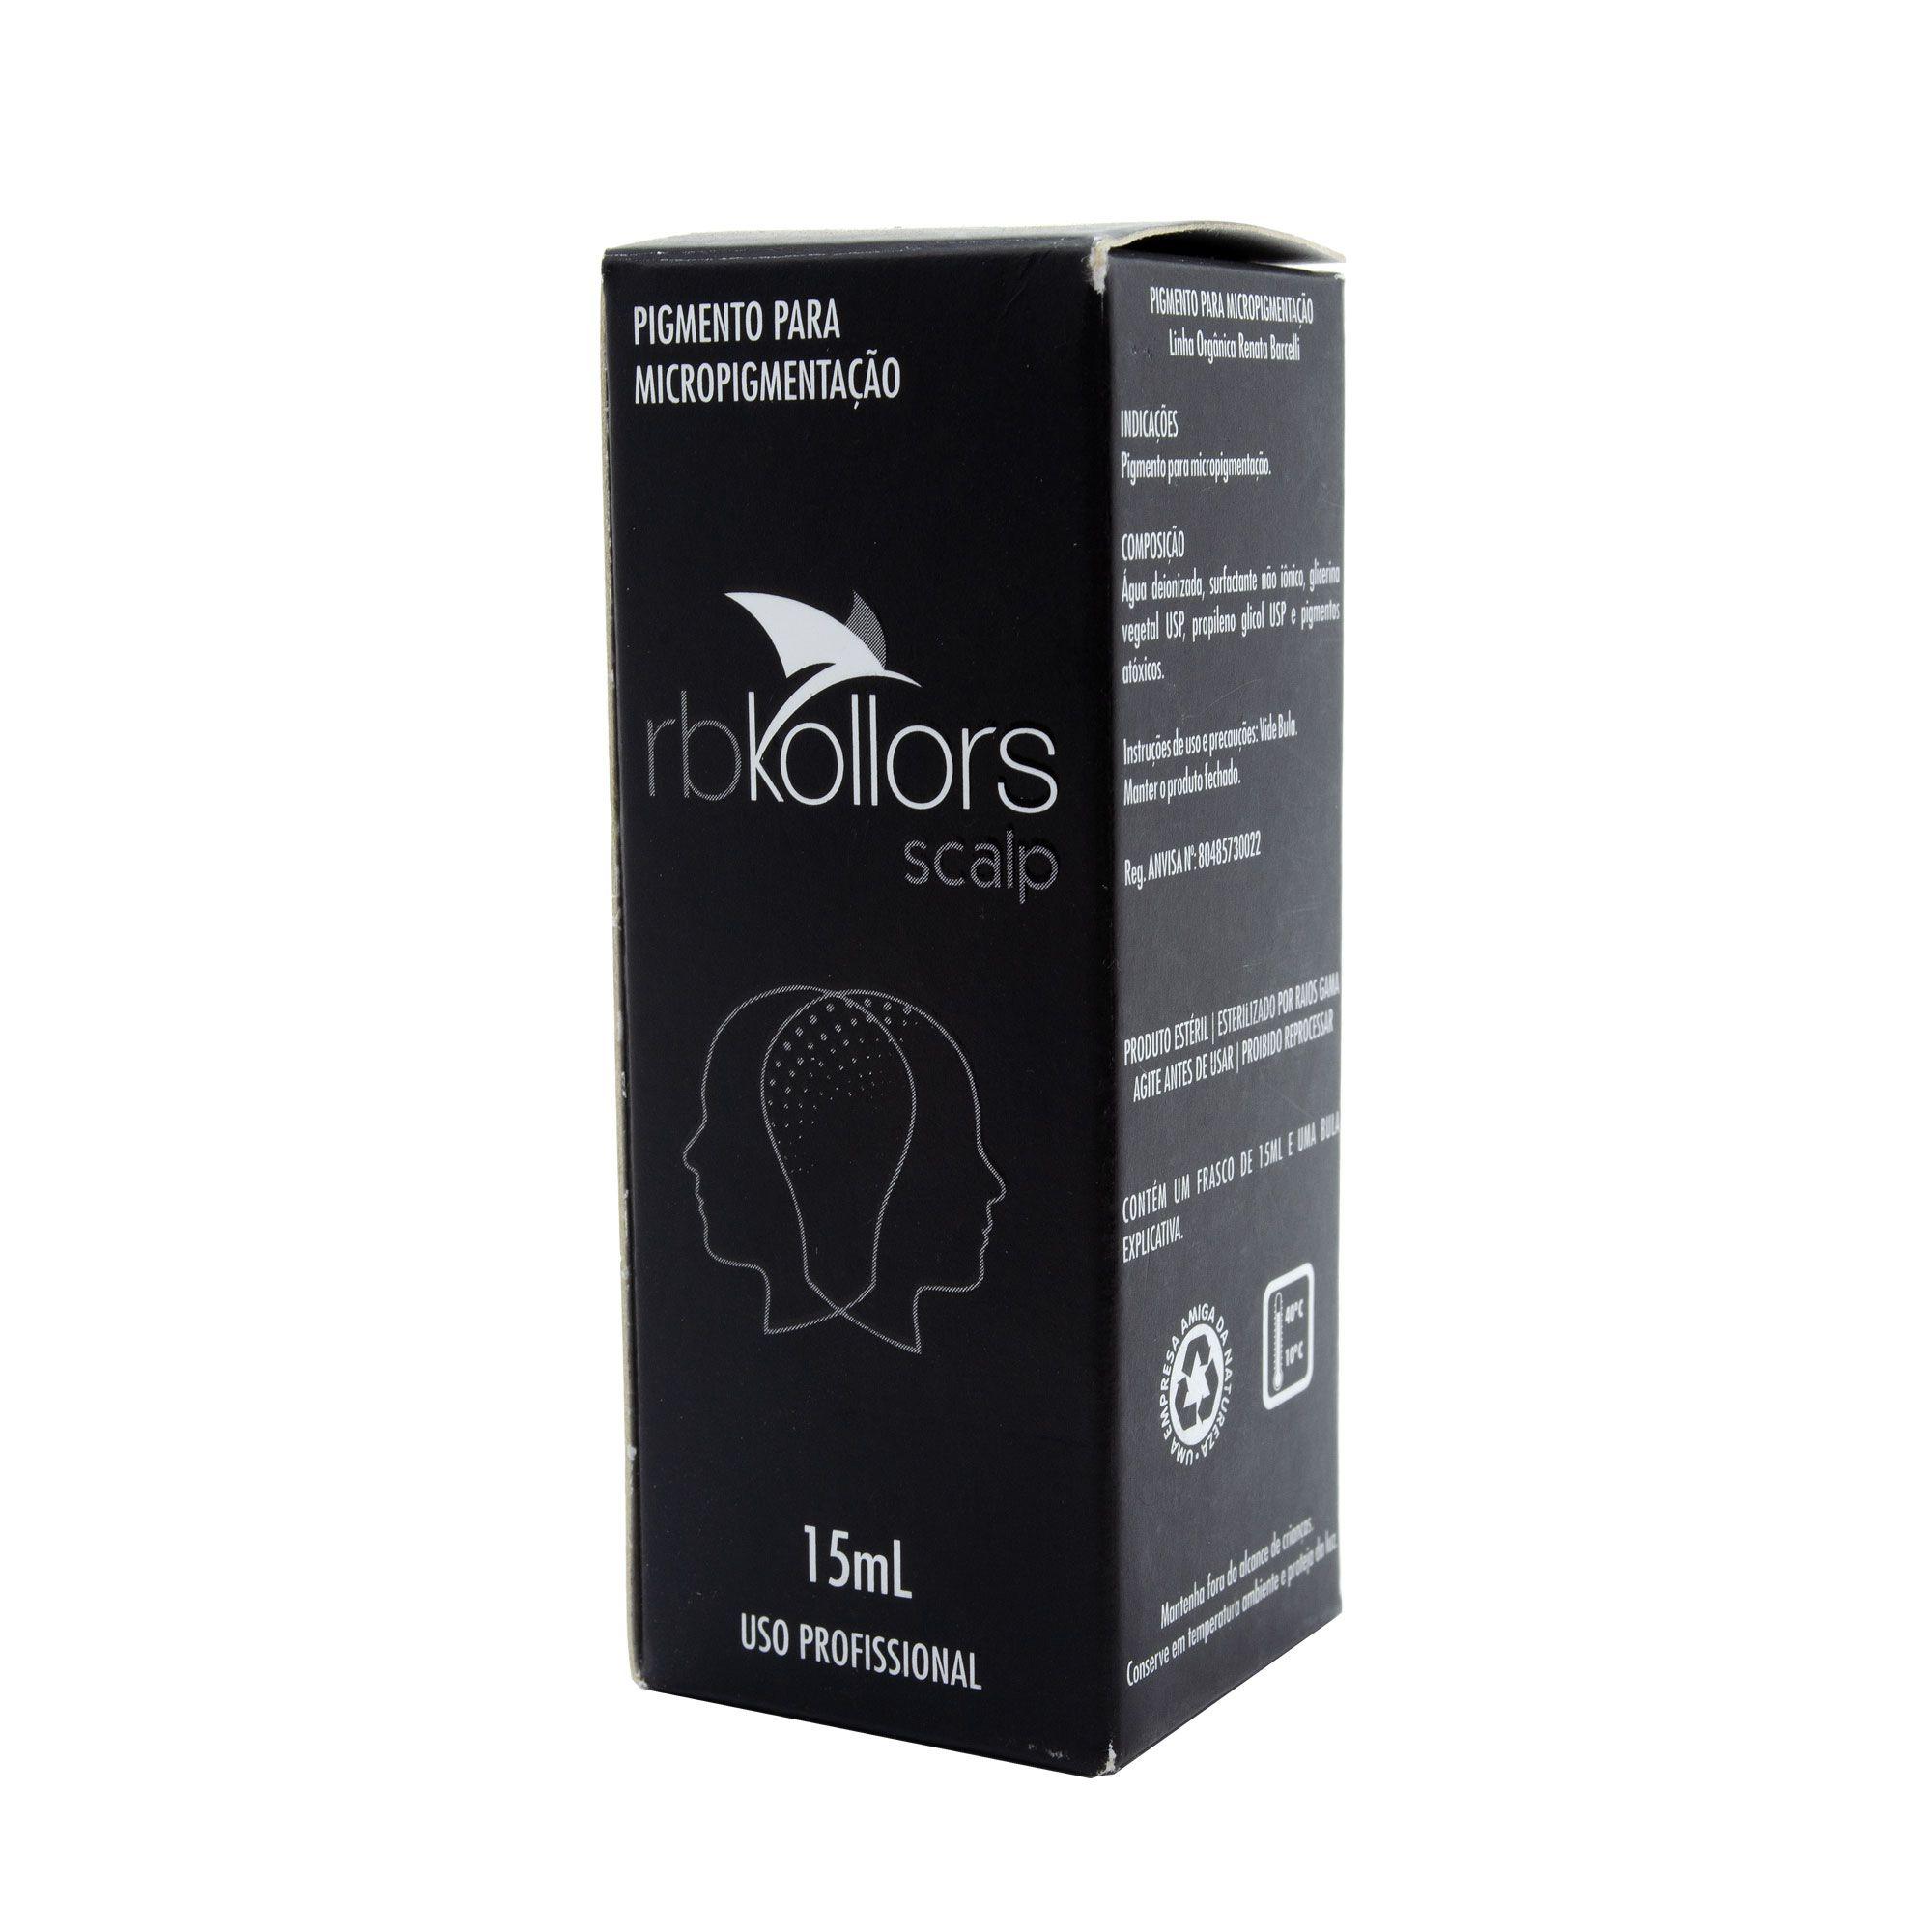 Pigmento Rb Kollors 15ml Scalp Slad